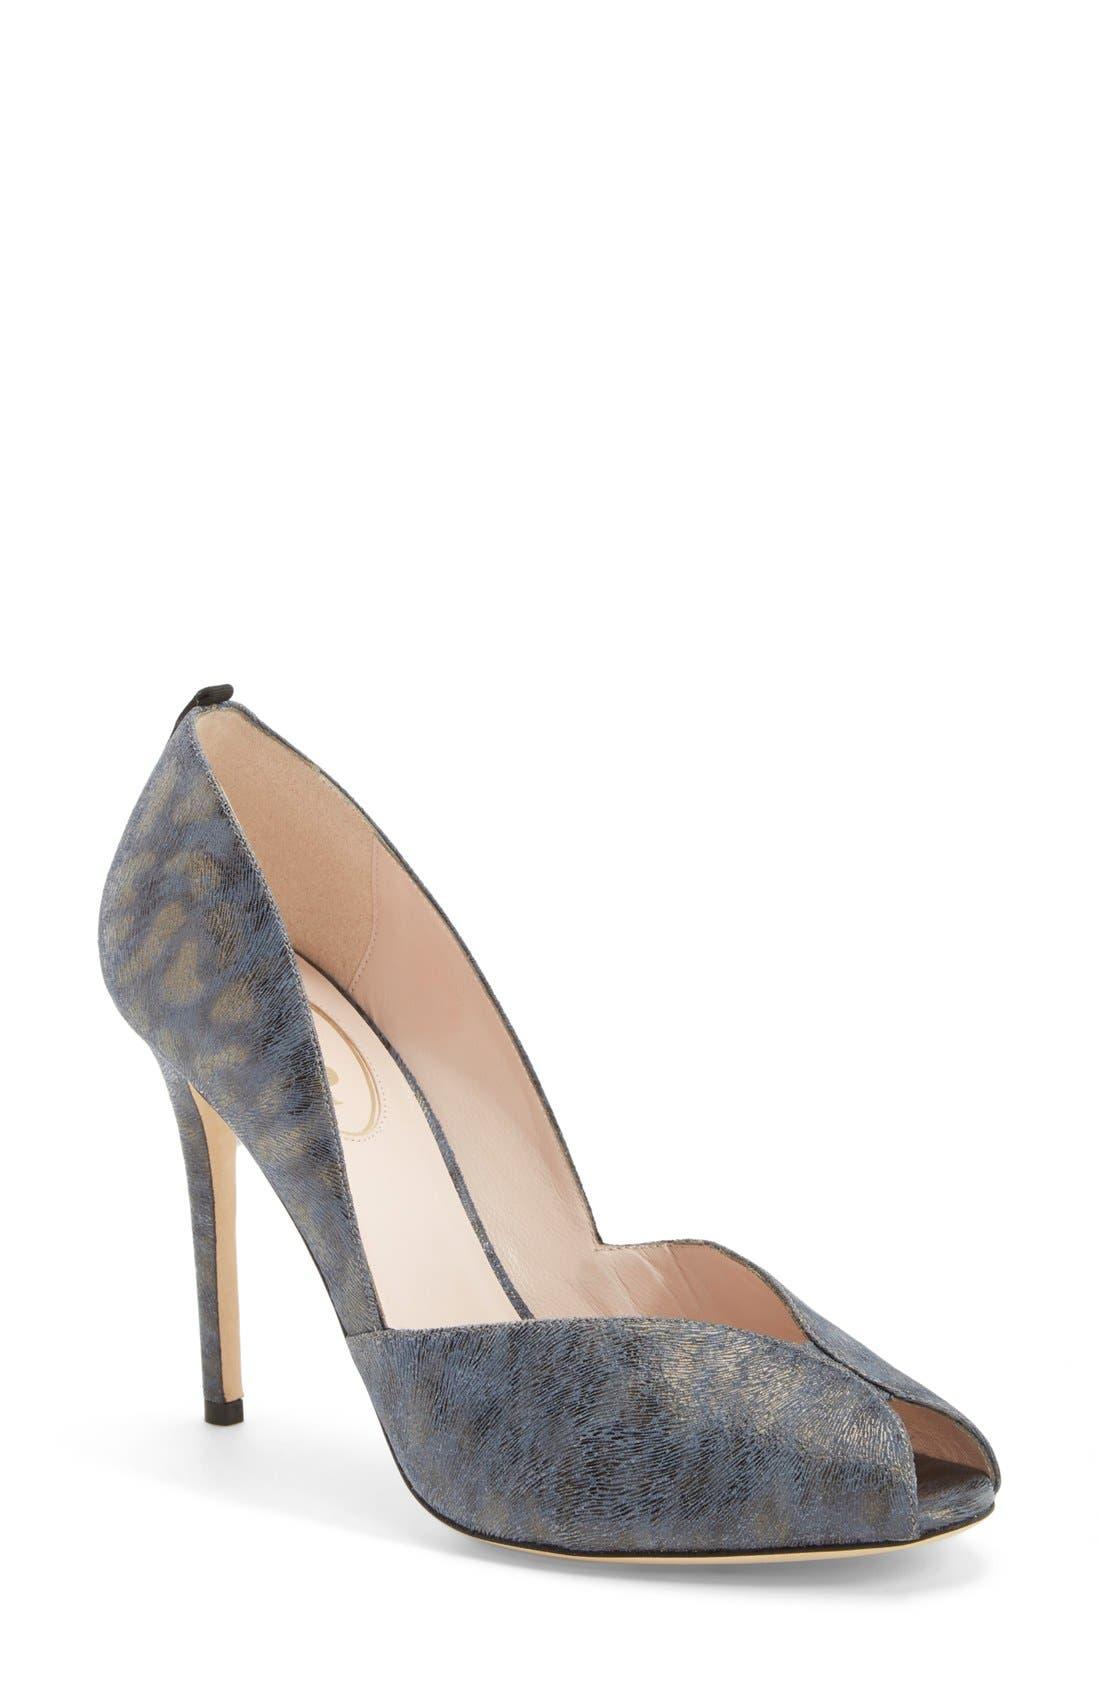 'Naomi' Peep Toe Pump,                             Main thumbnail 1, color,                             Blue Leopard Leather